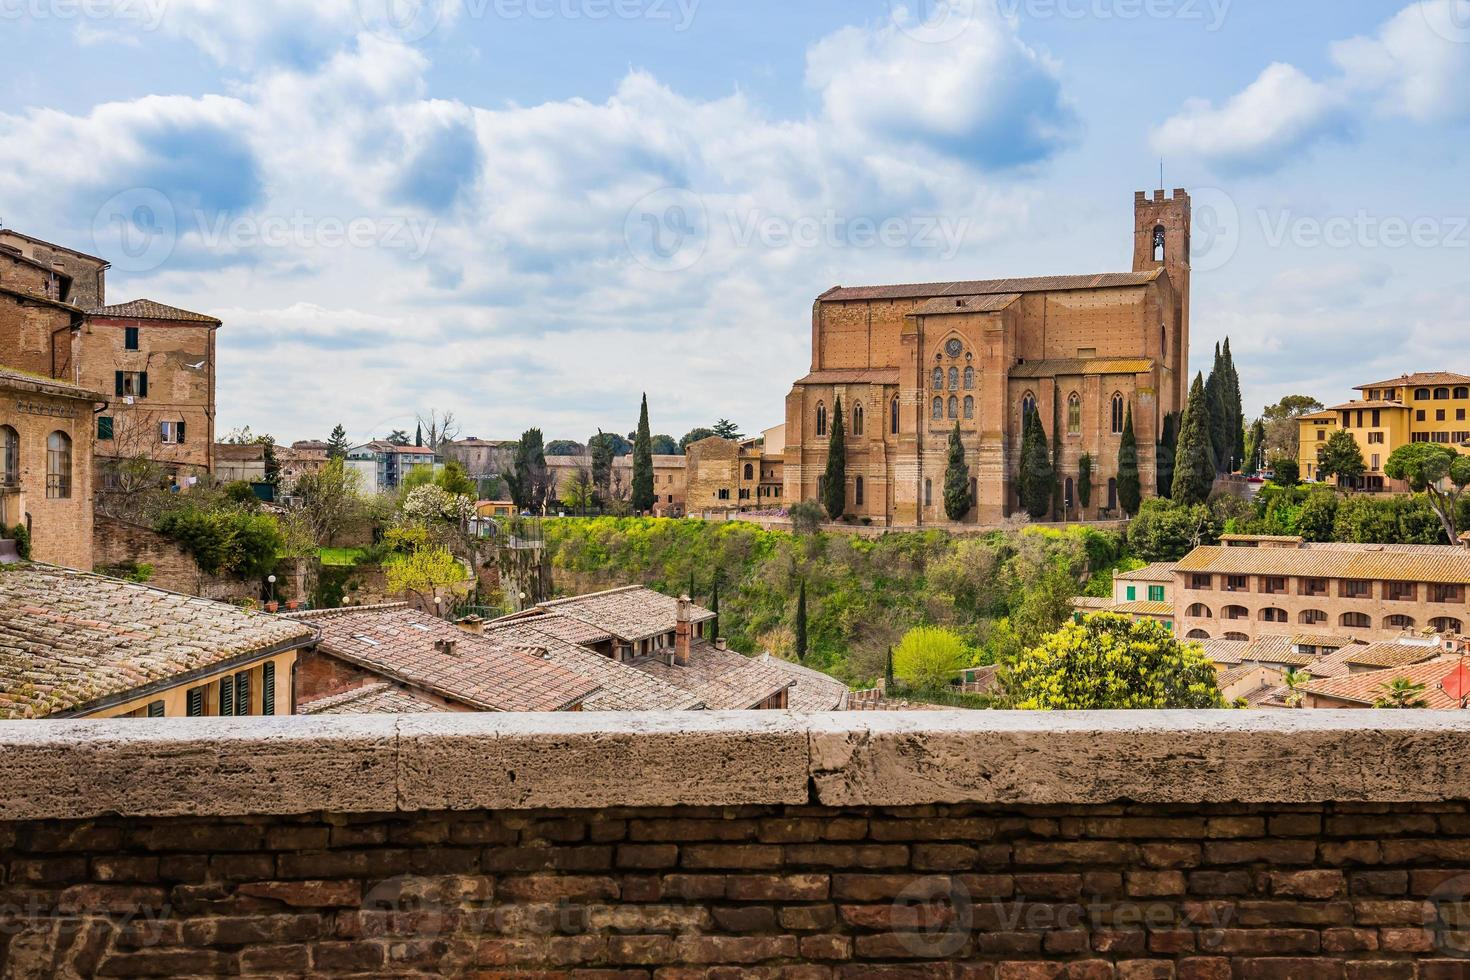 das siena stadtbild in der südtoskana, italien foto